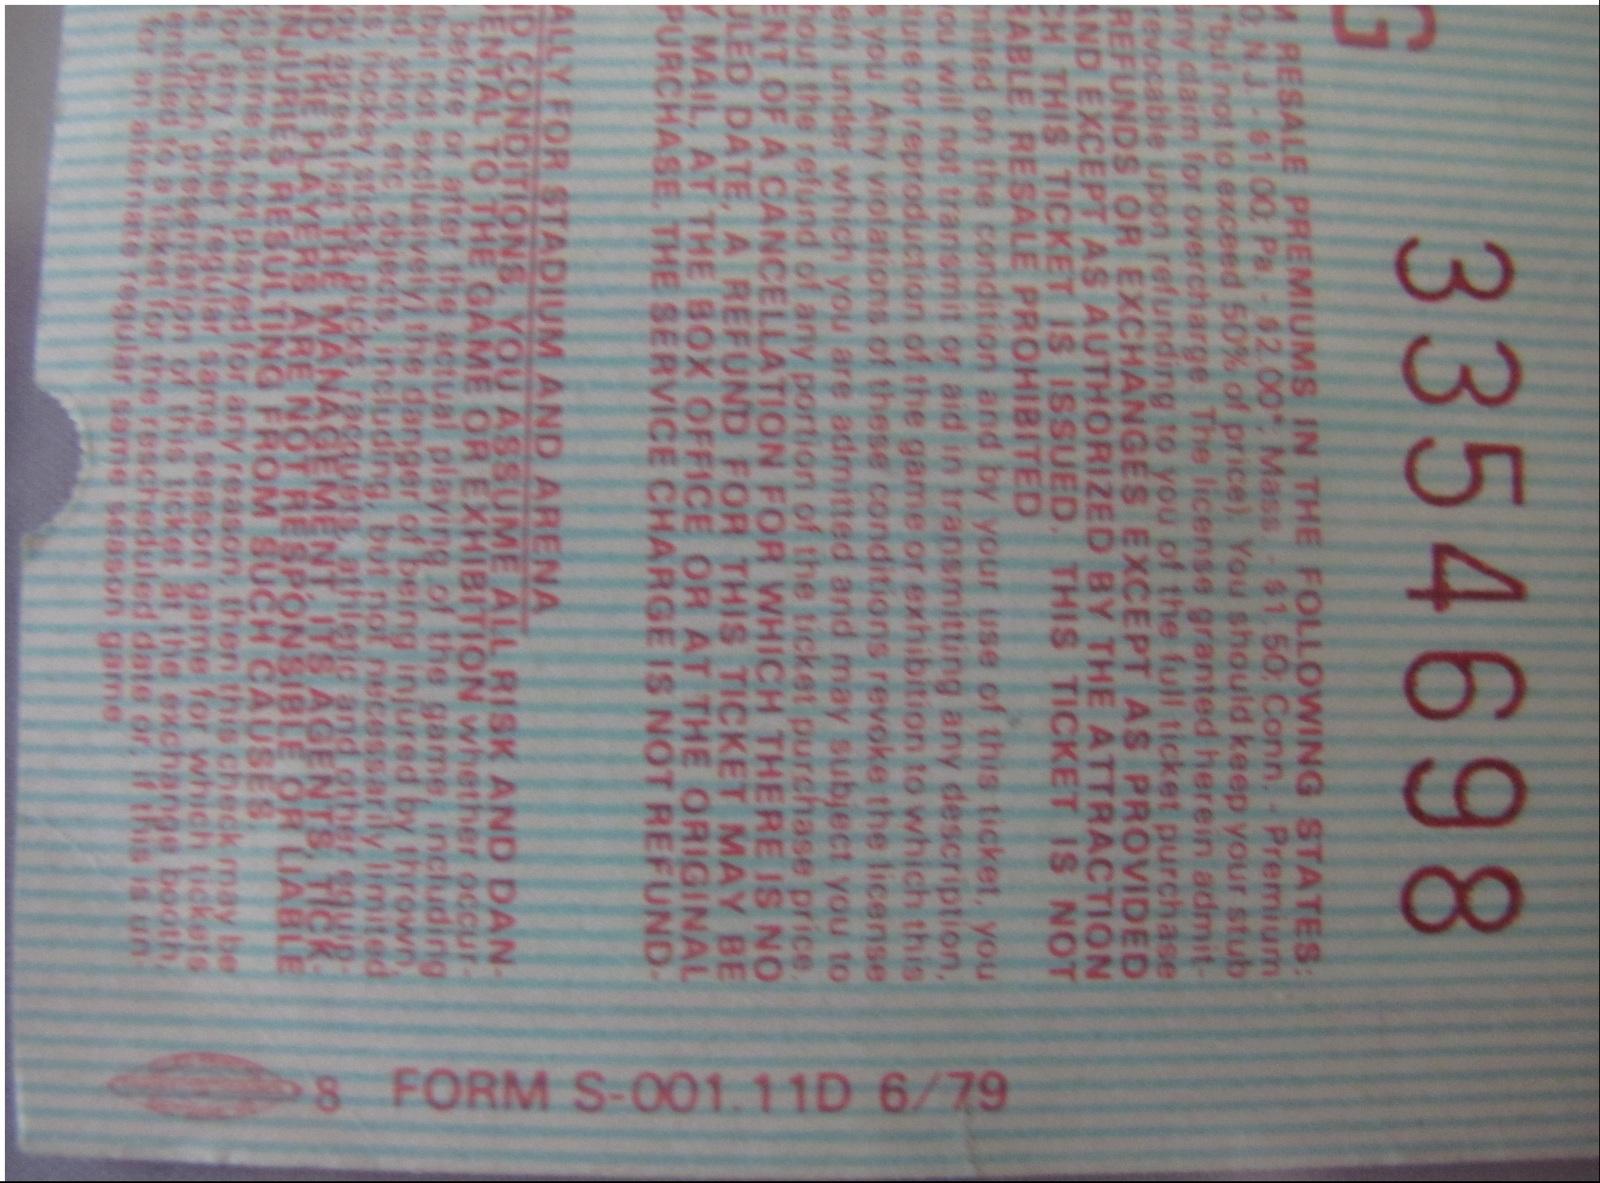 PINK FLOYD 1980 The Wall Tour Nassau Coliseum Full 3/4 Concert Ticket Scarce